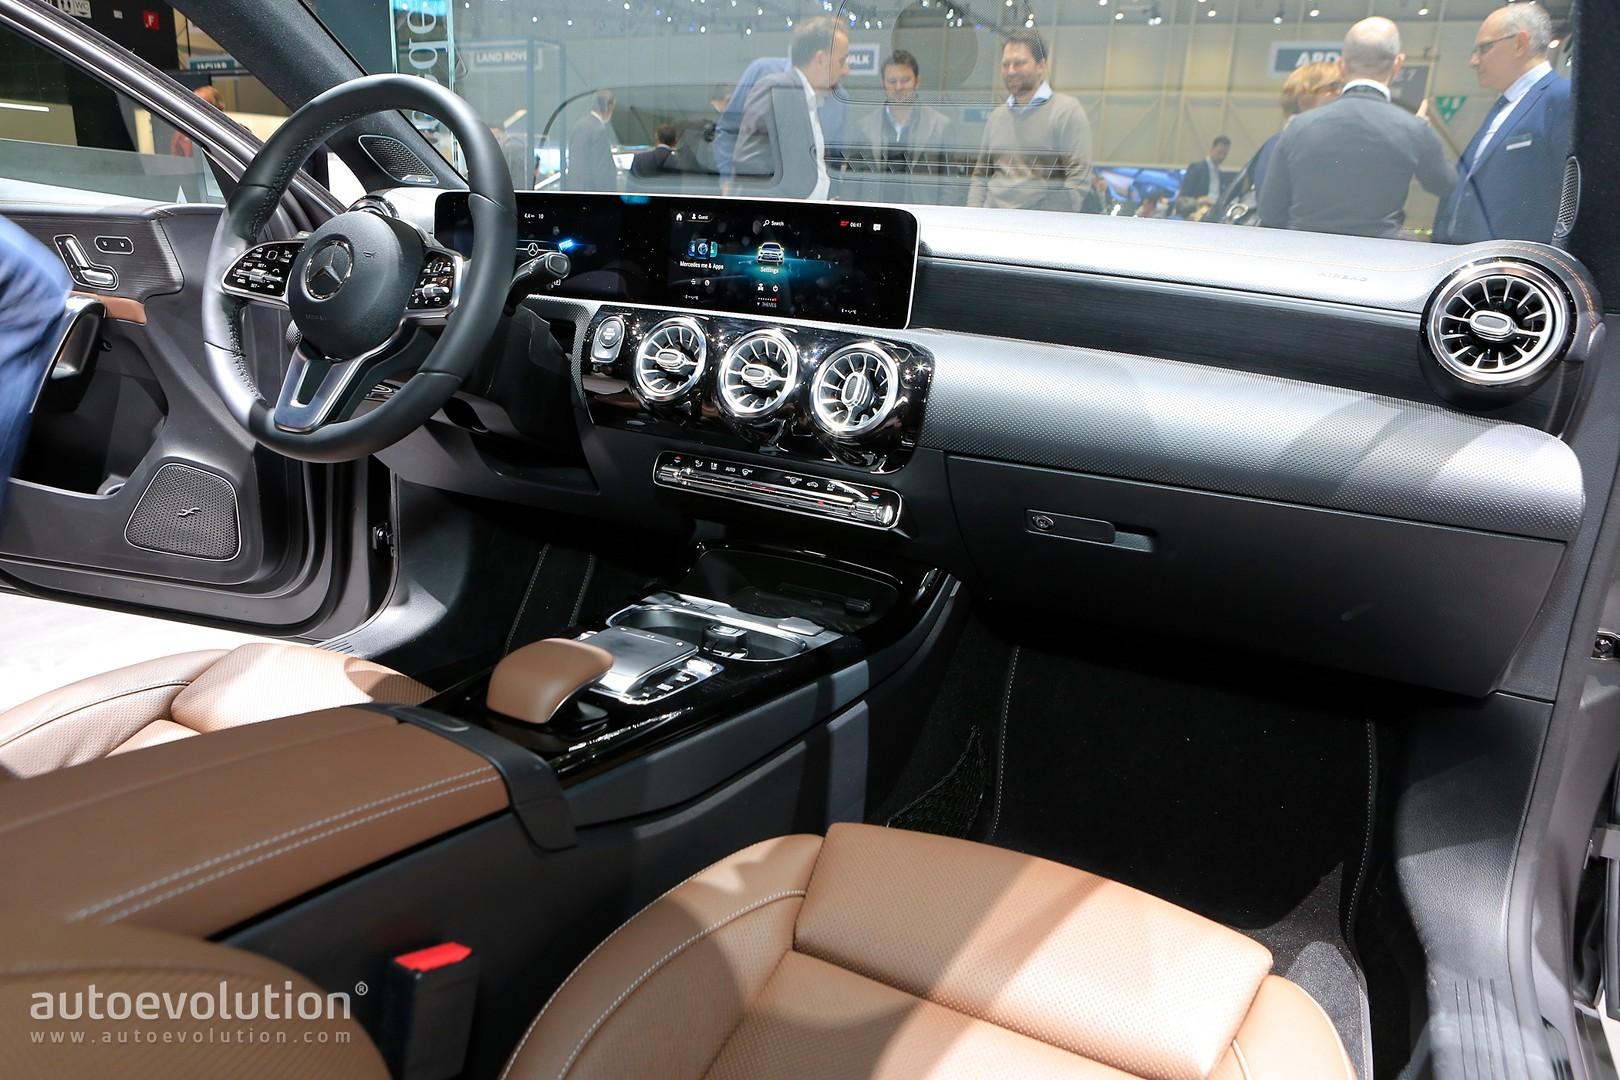 2019 Mercedes Benz A Class Redefines The Premium Compact